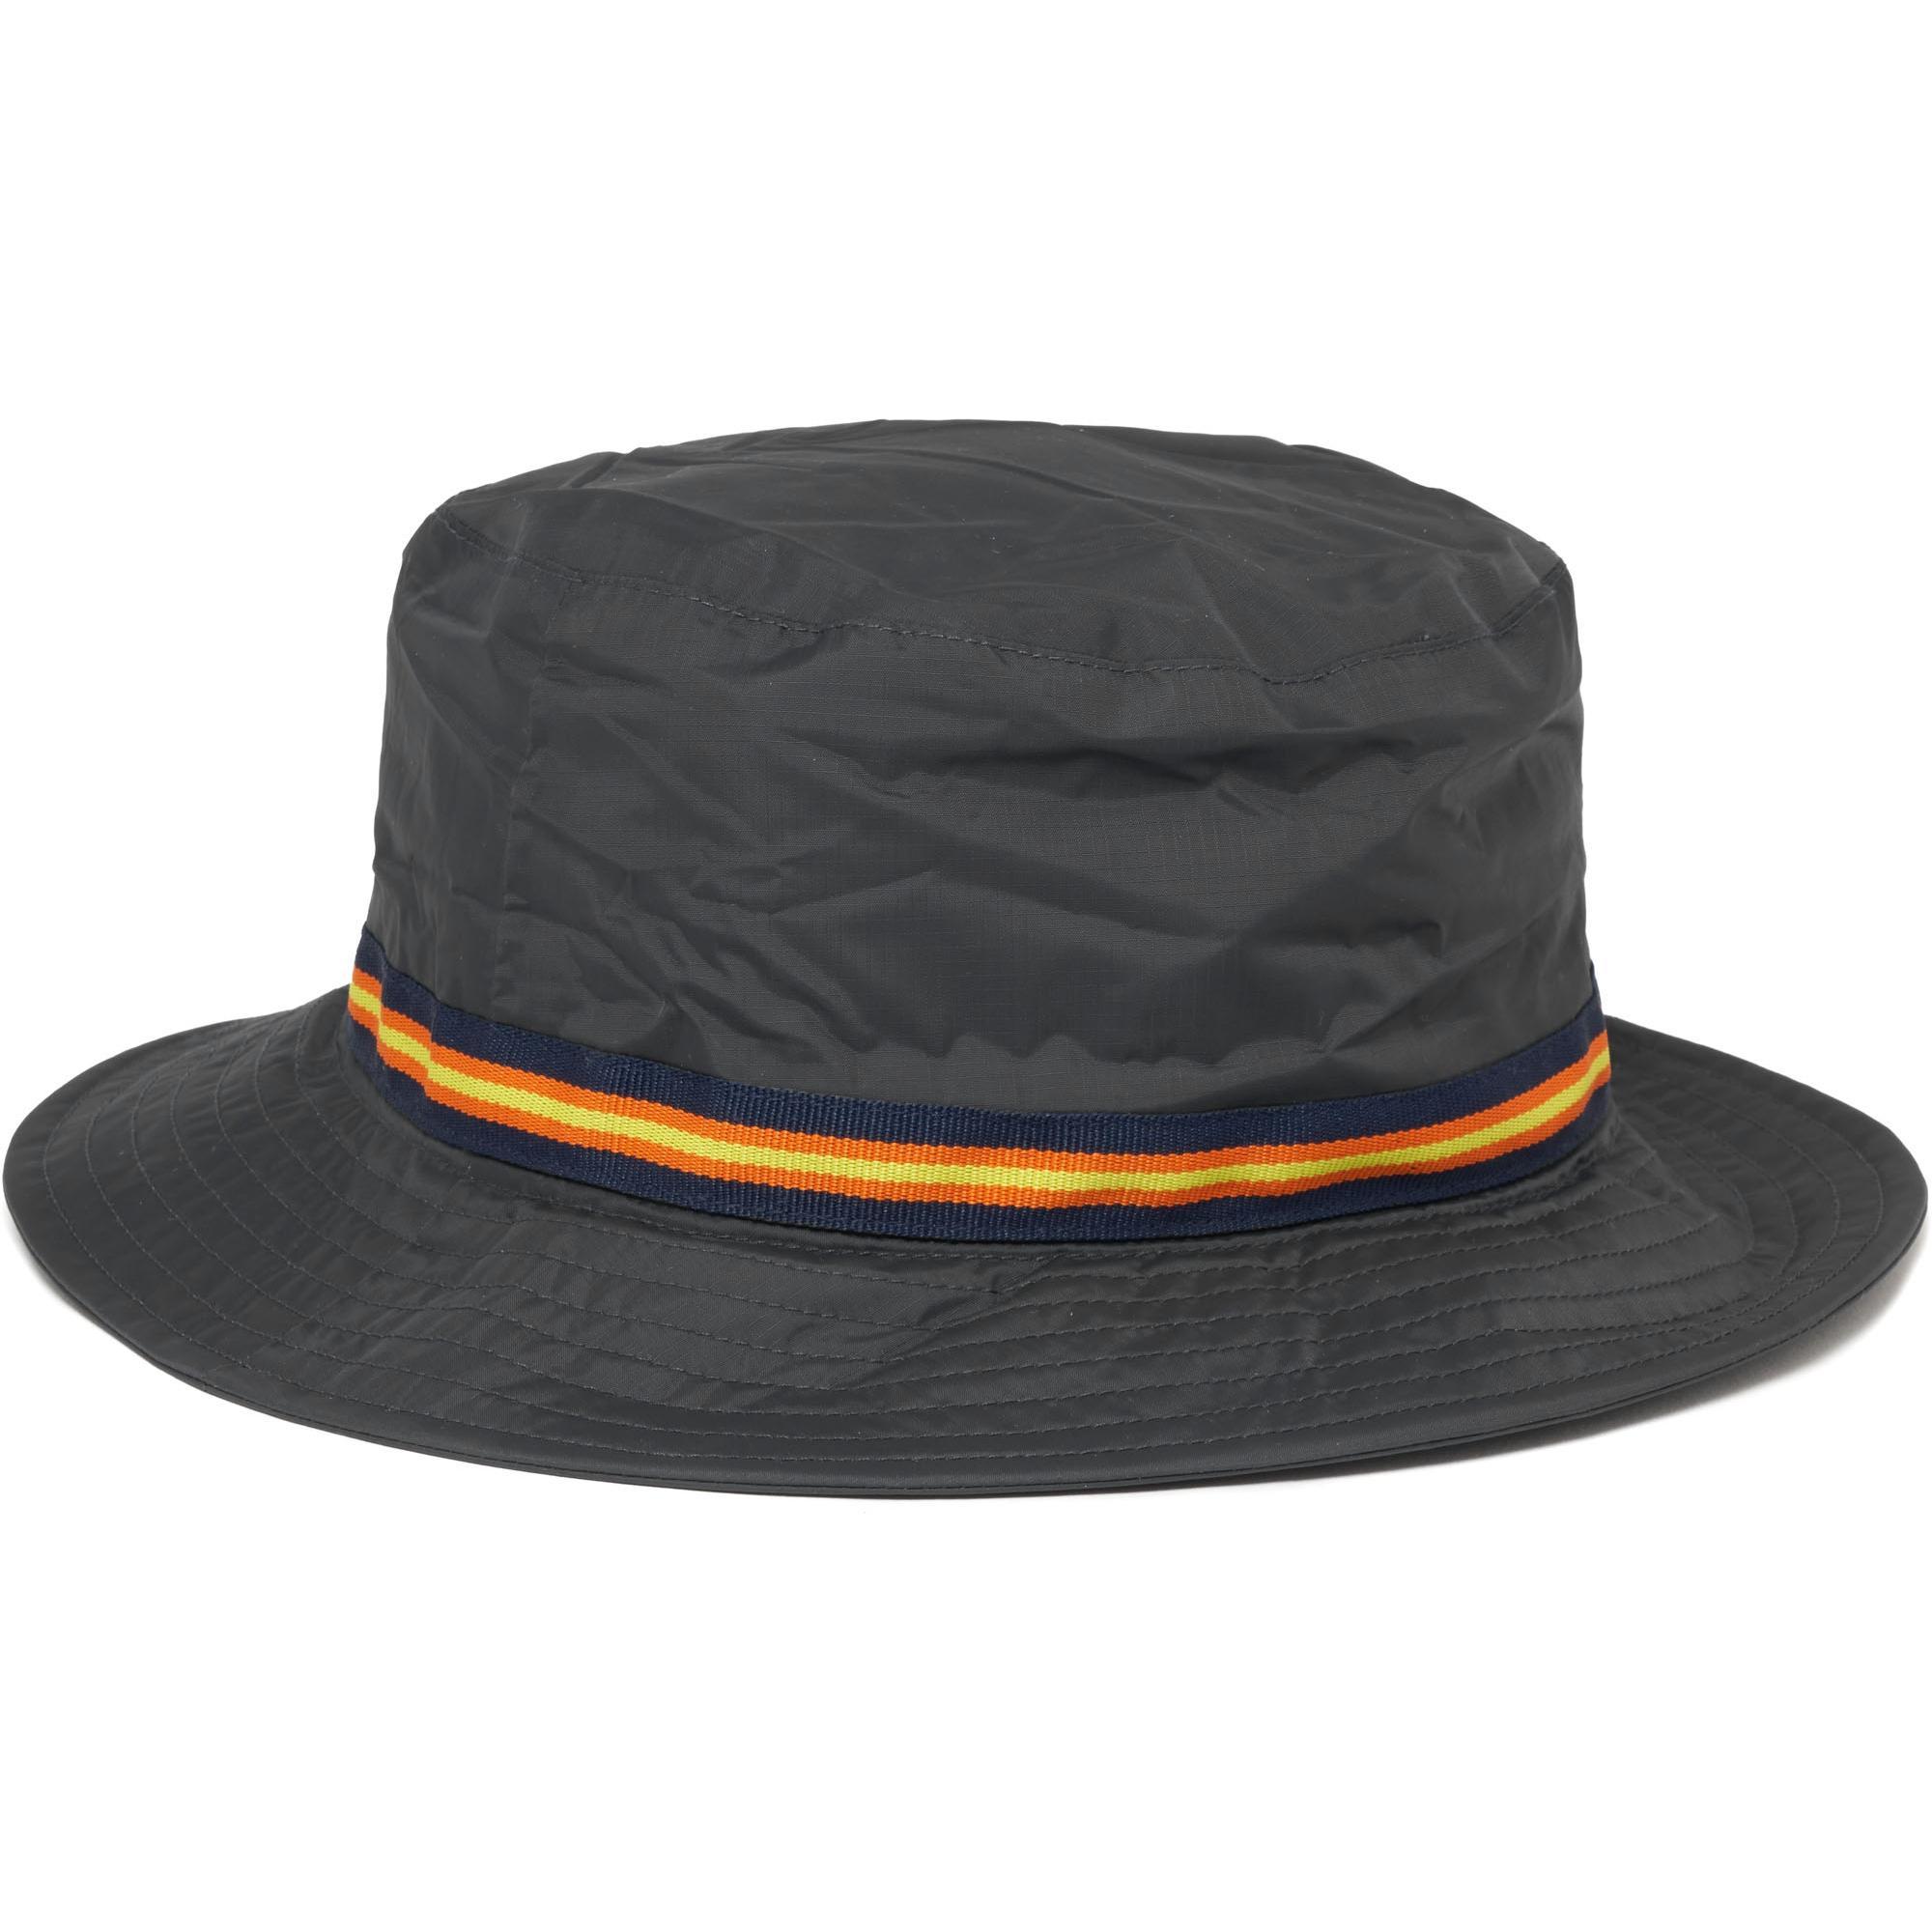 75d192fd5ac Lyst - K-Way Black Le Vrai Pascal 3.0 Packable Bucket Hat in Black ...